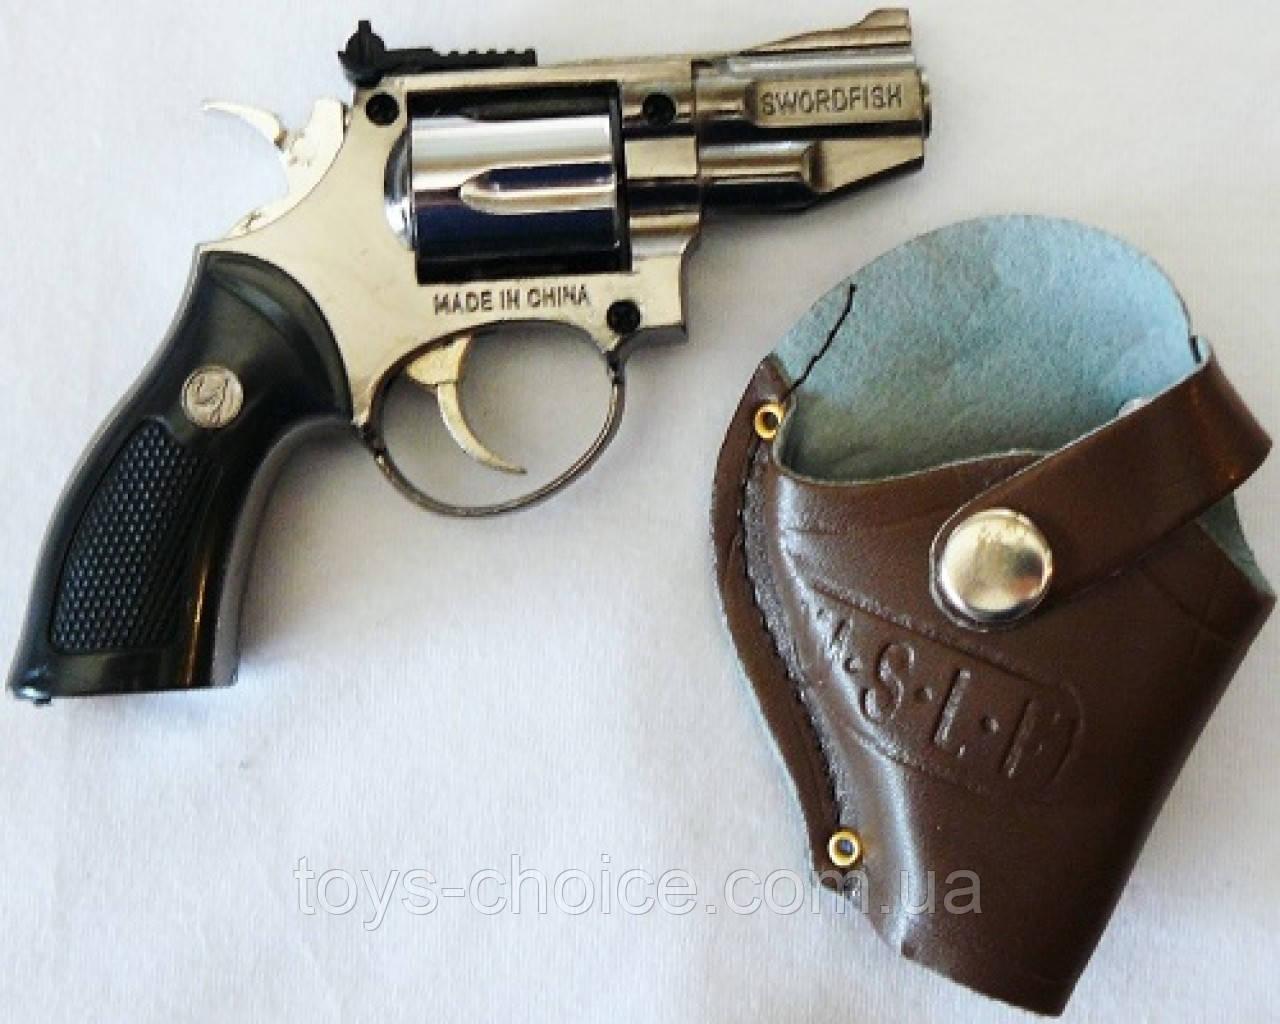 Зажигалка В Виде Пистолета №3851